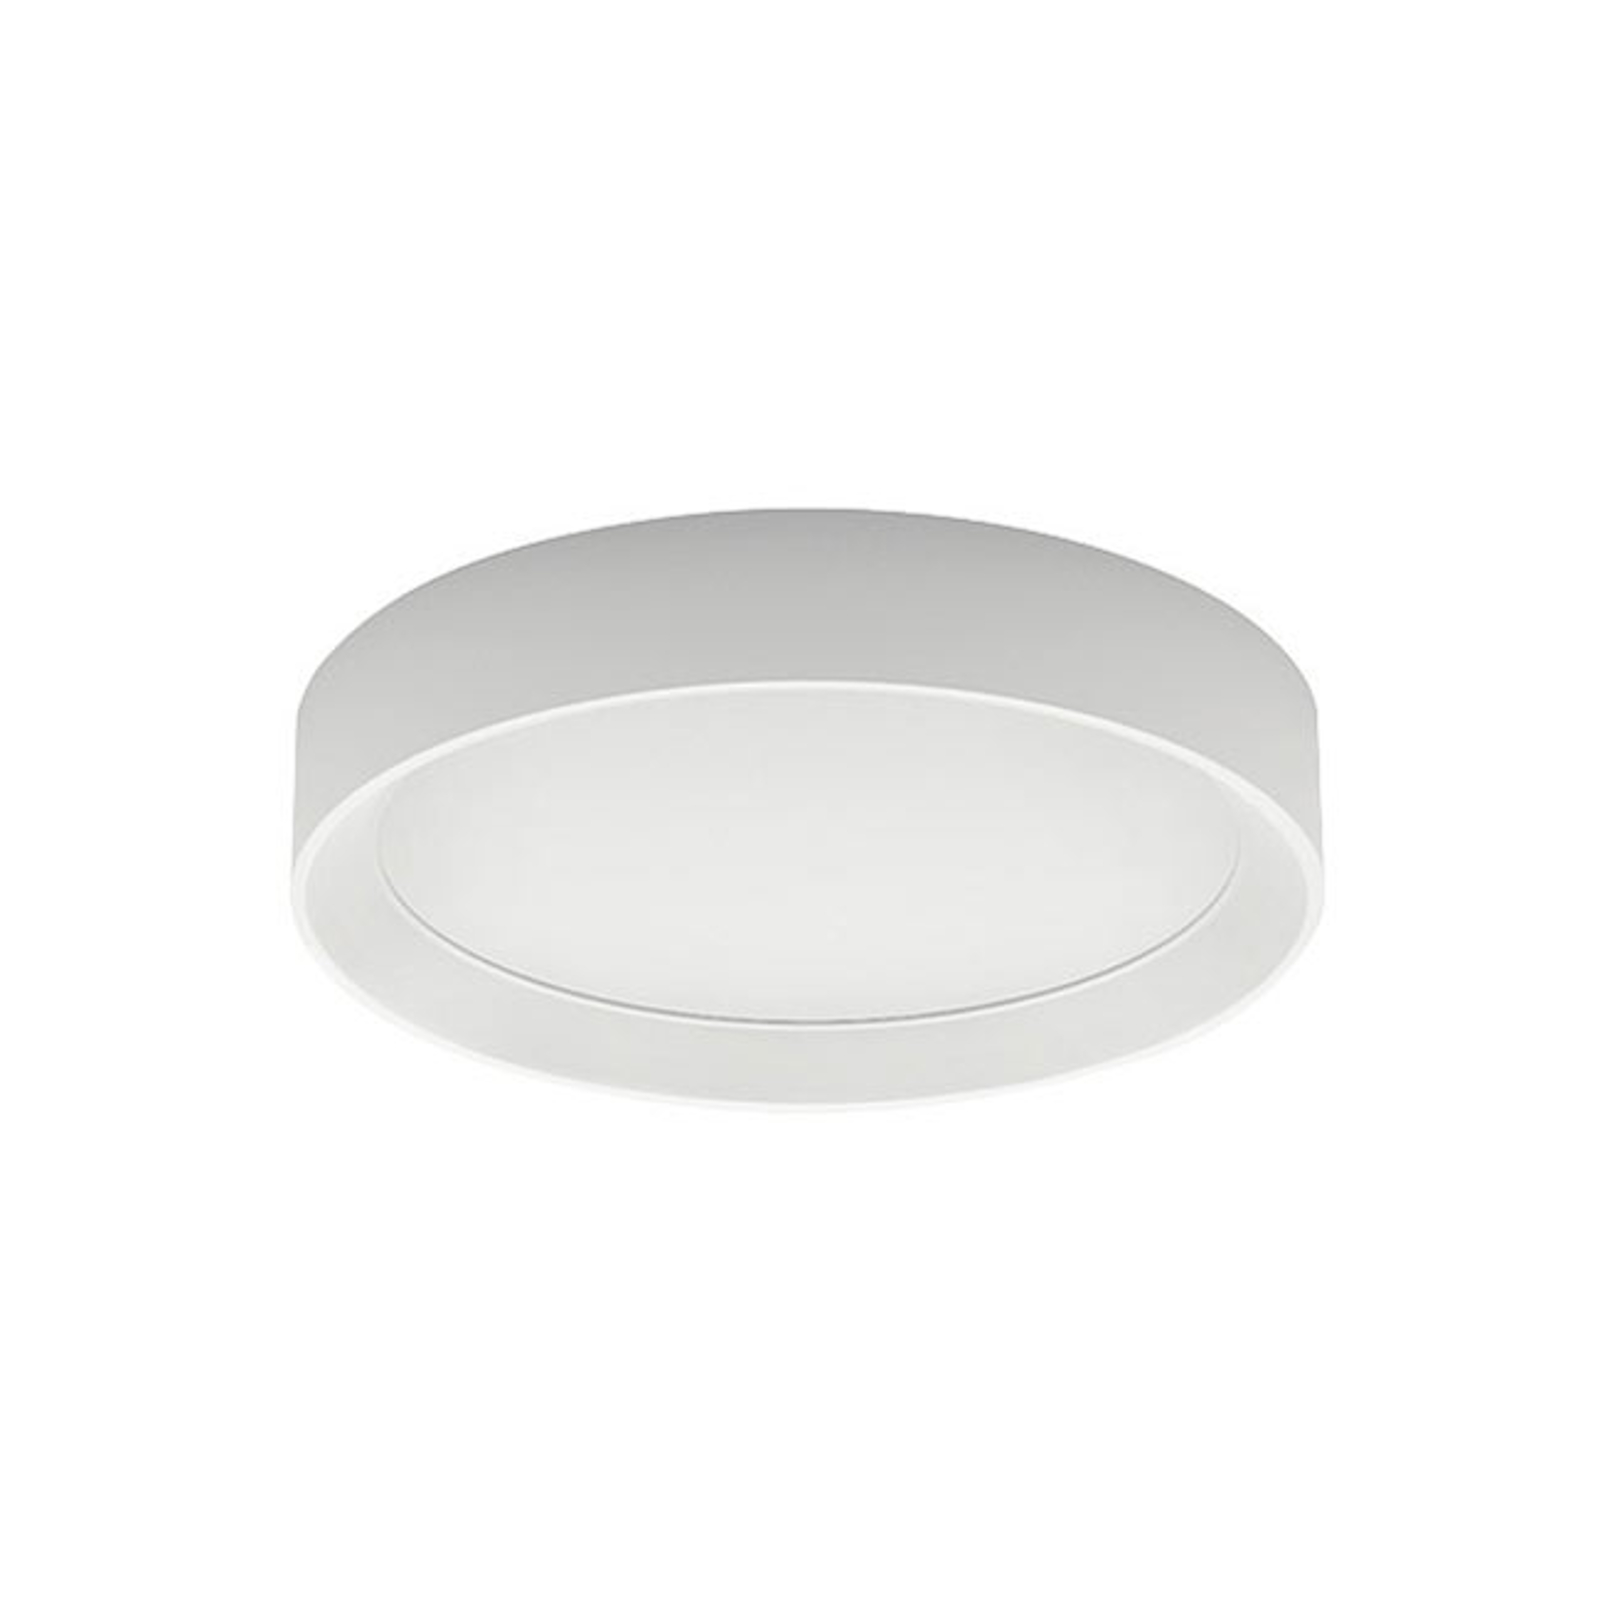 Lampa sufitowa LED Tara R, okrągła, Ø 31 cm